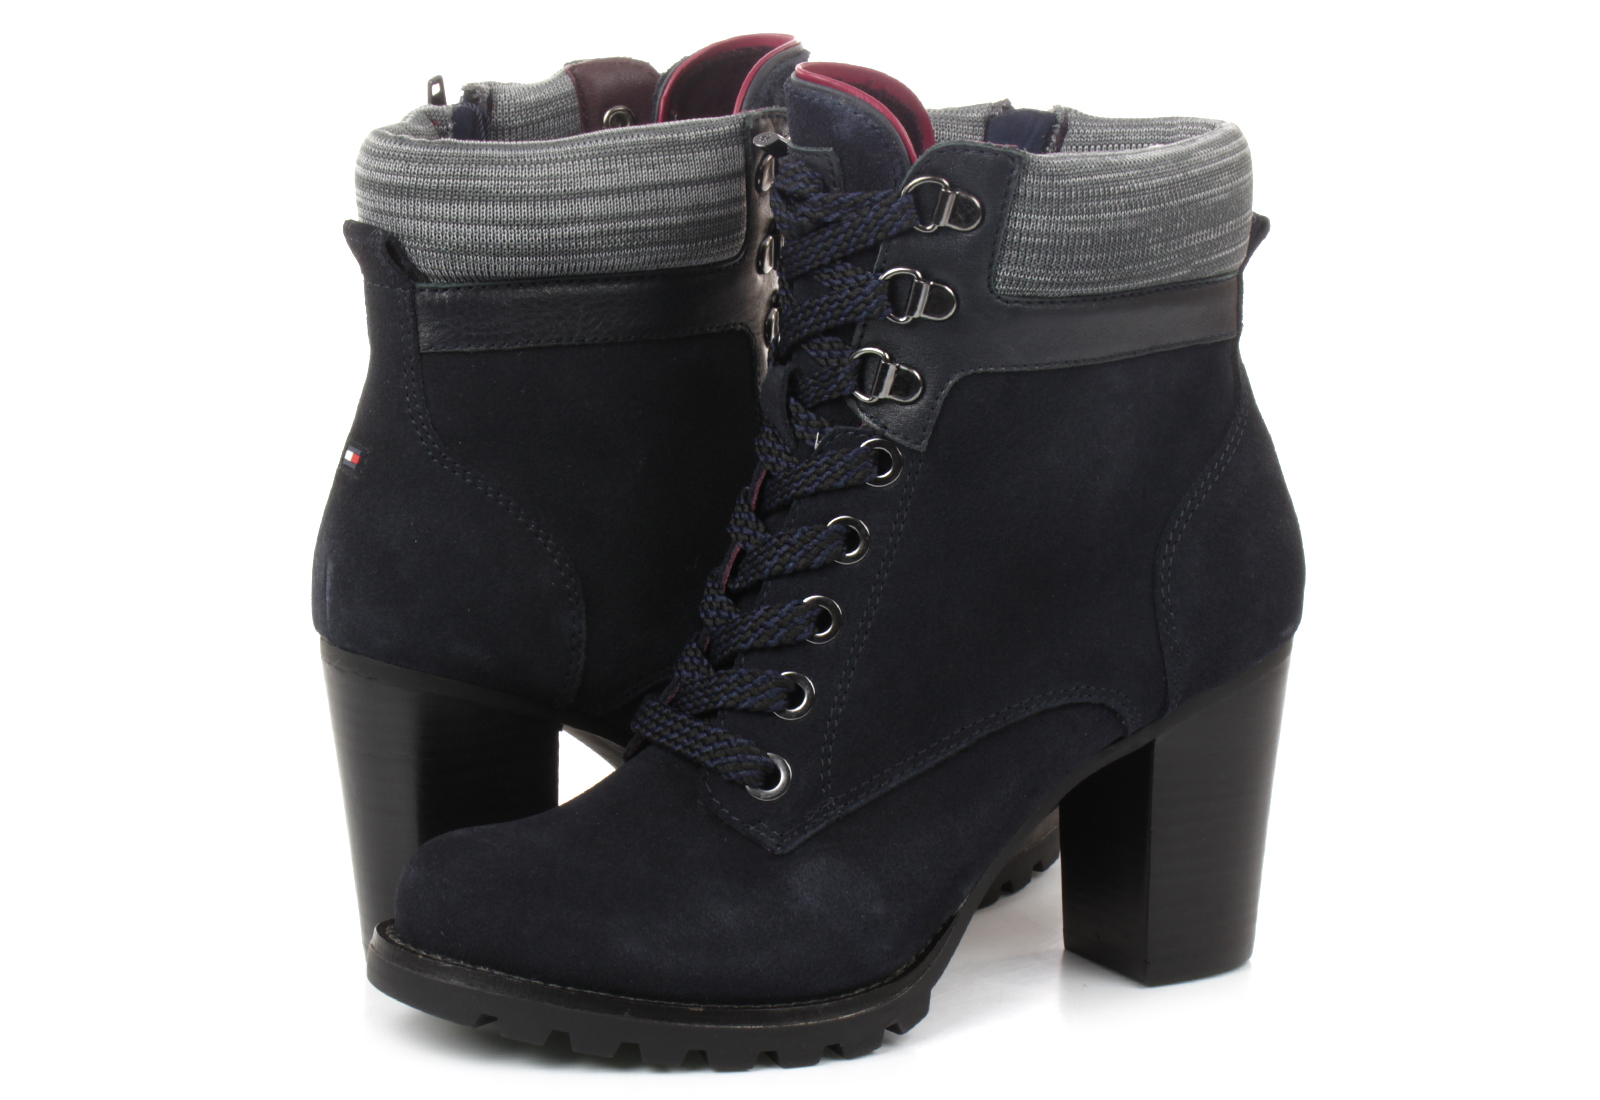 Tommy Hilfiger Csizma - Isabella 18b - 17F-1537-403 - Office Shoes ... a61d1b43b0